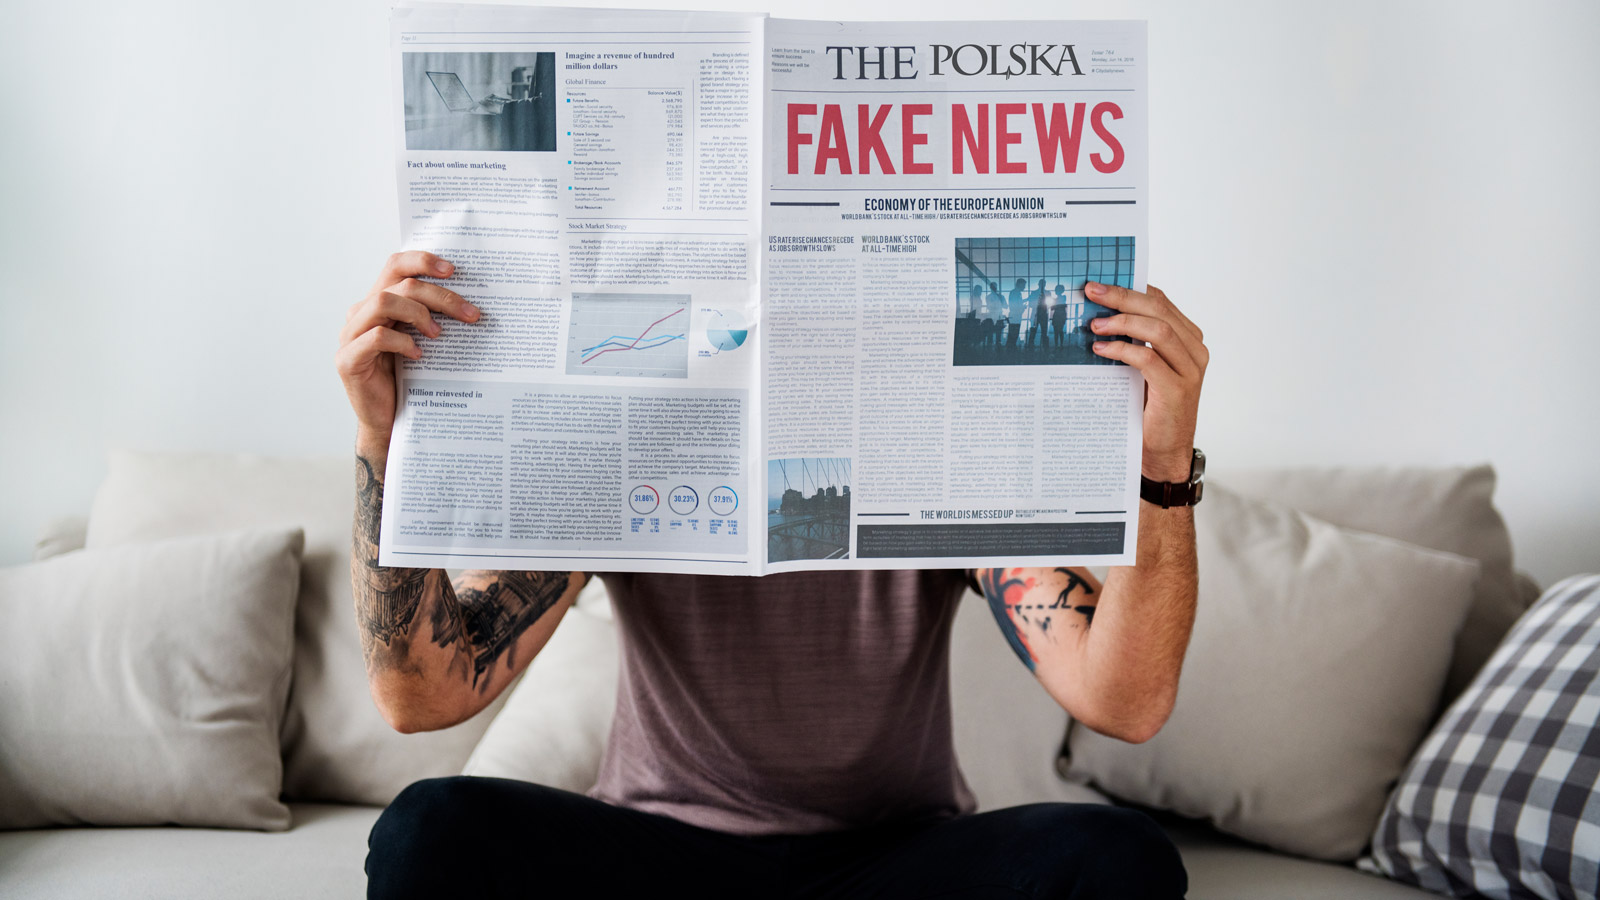 Walka z FAKE NEWS w Polsce Kampania mediarun fake news polska 2019